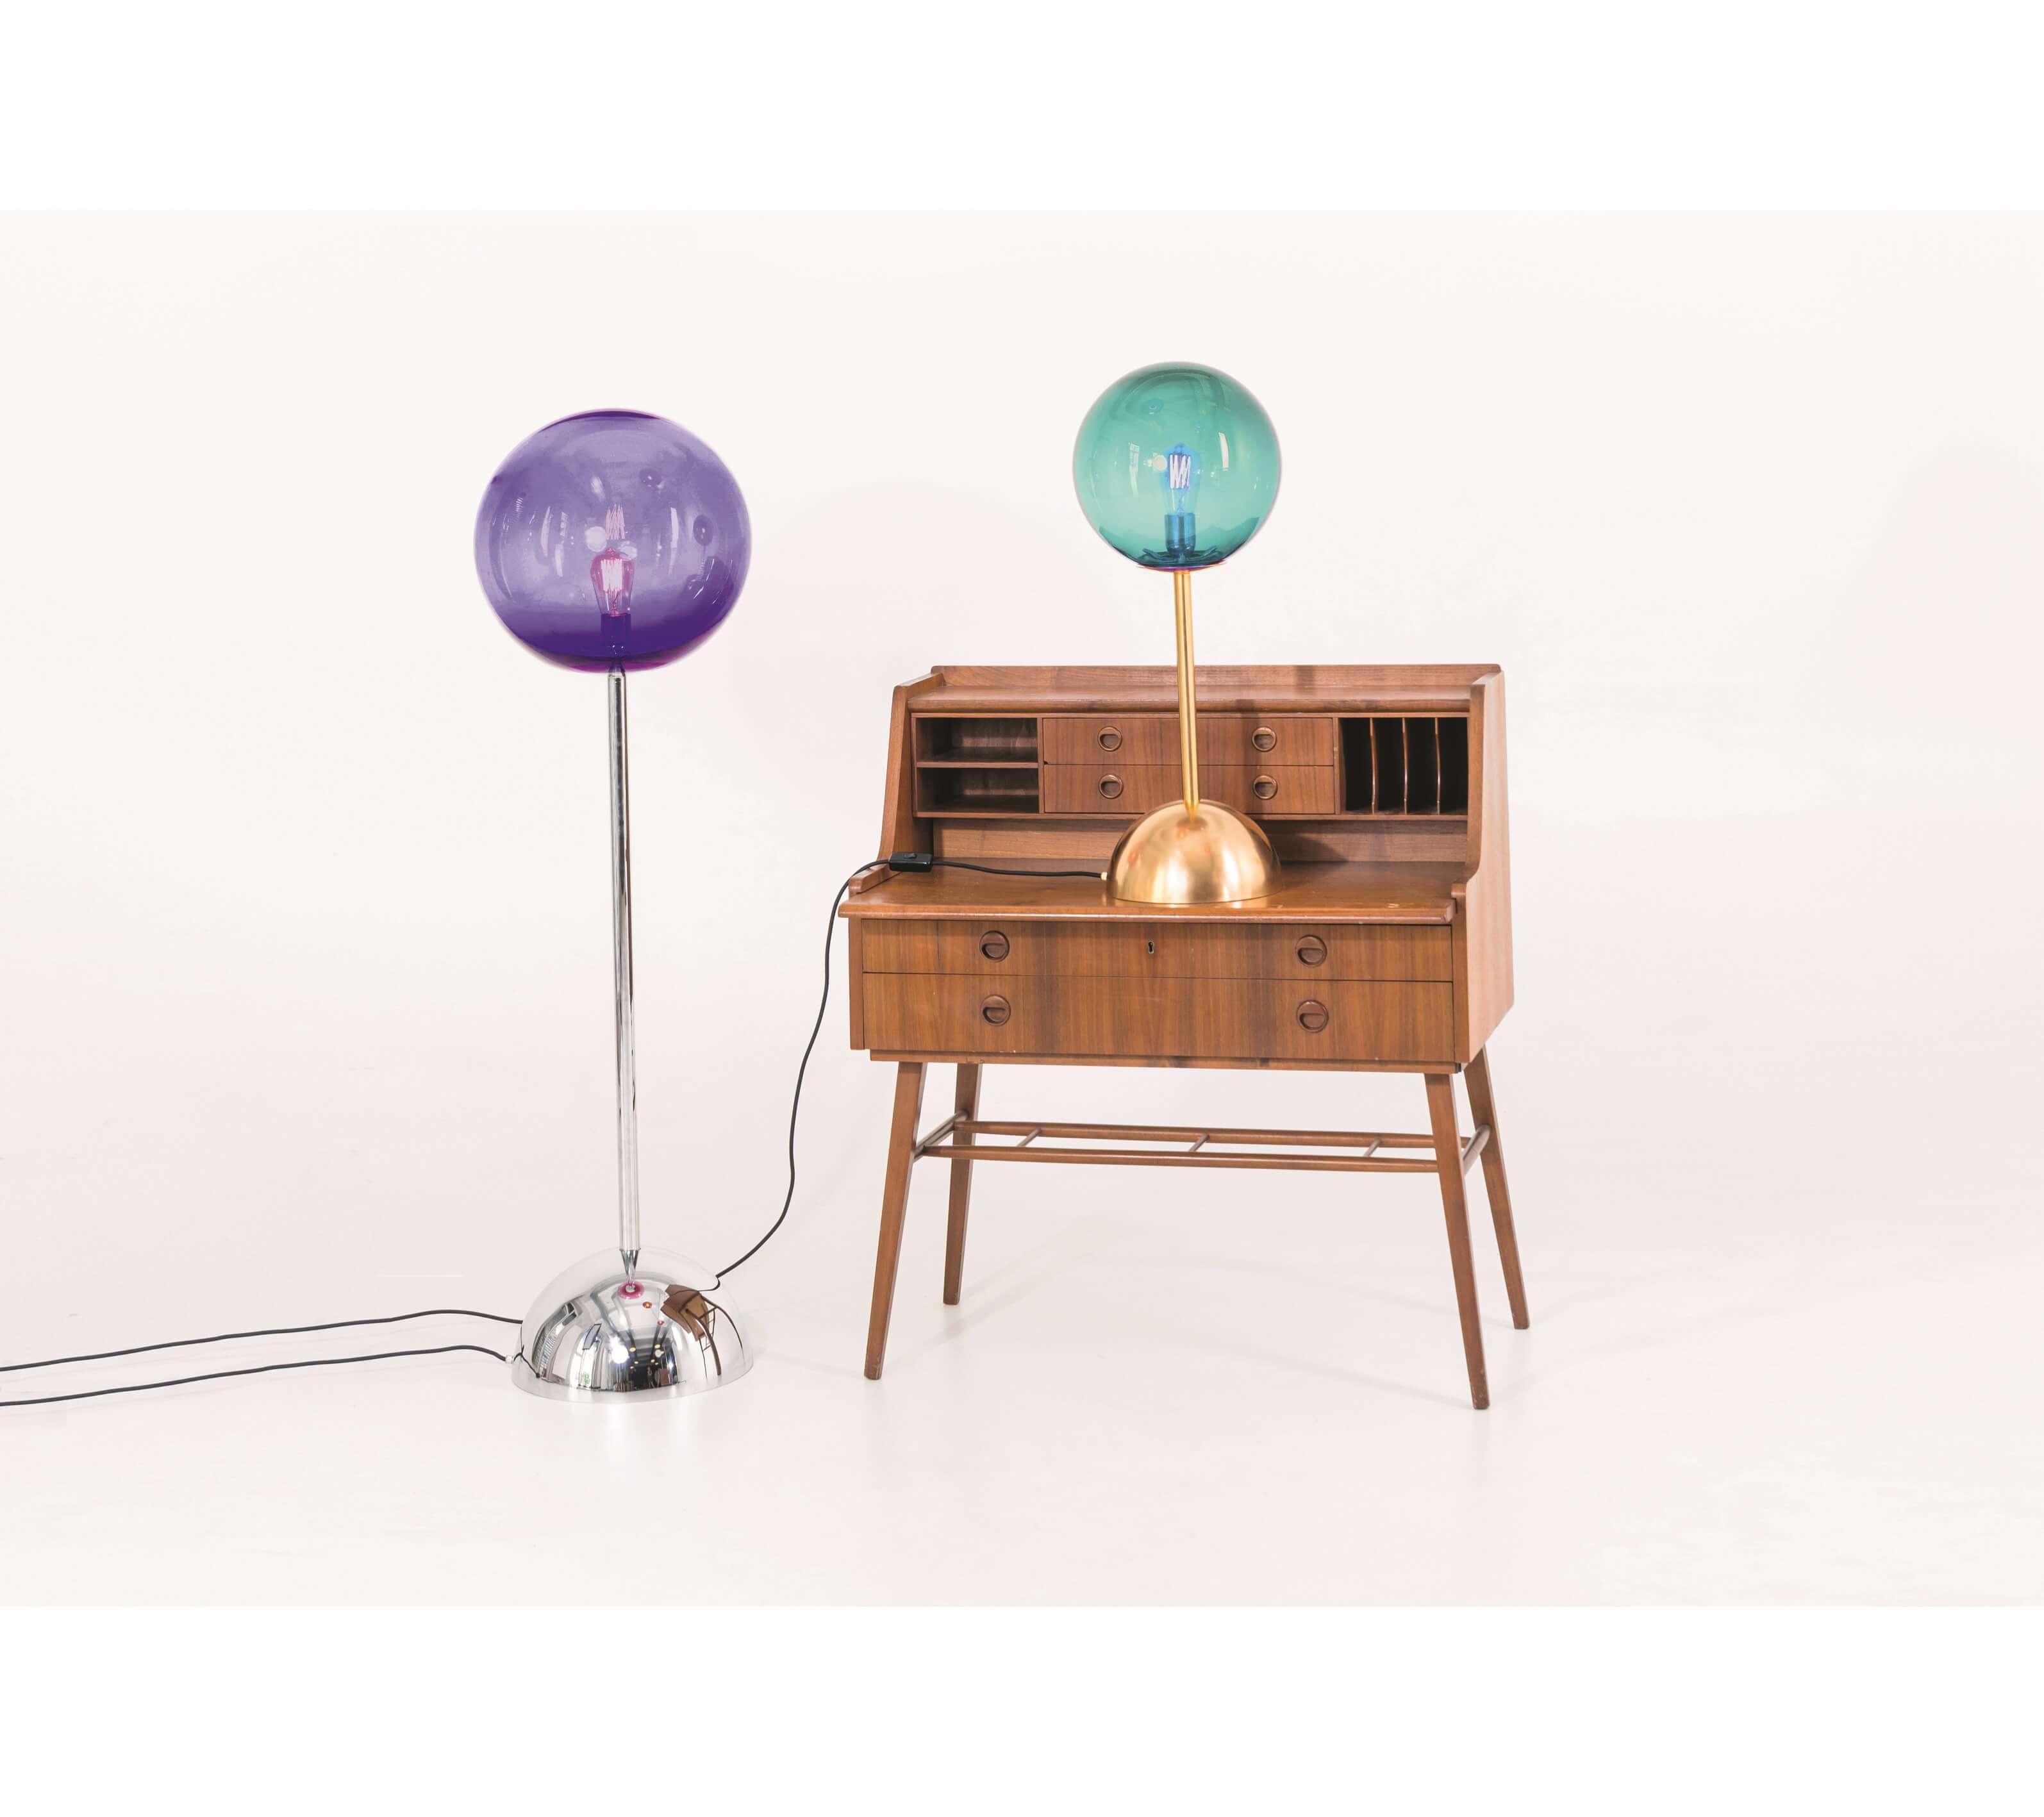 SUPER LOLLIPOP LAMP By DORIS DARLING